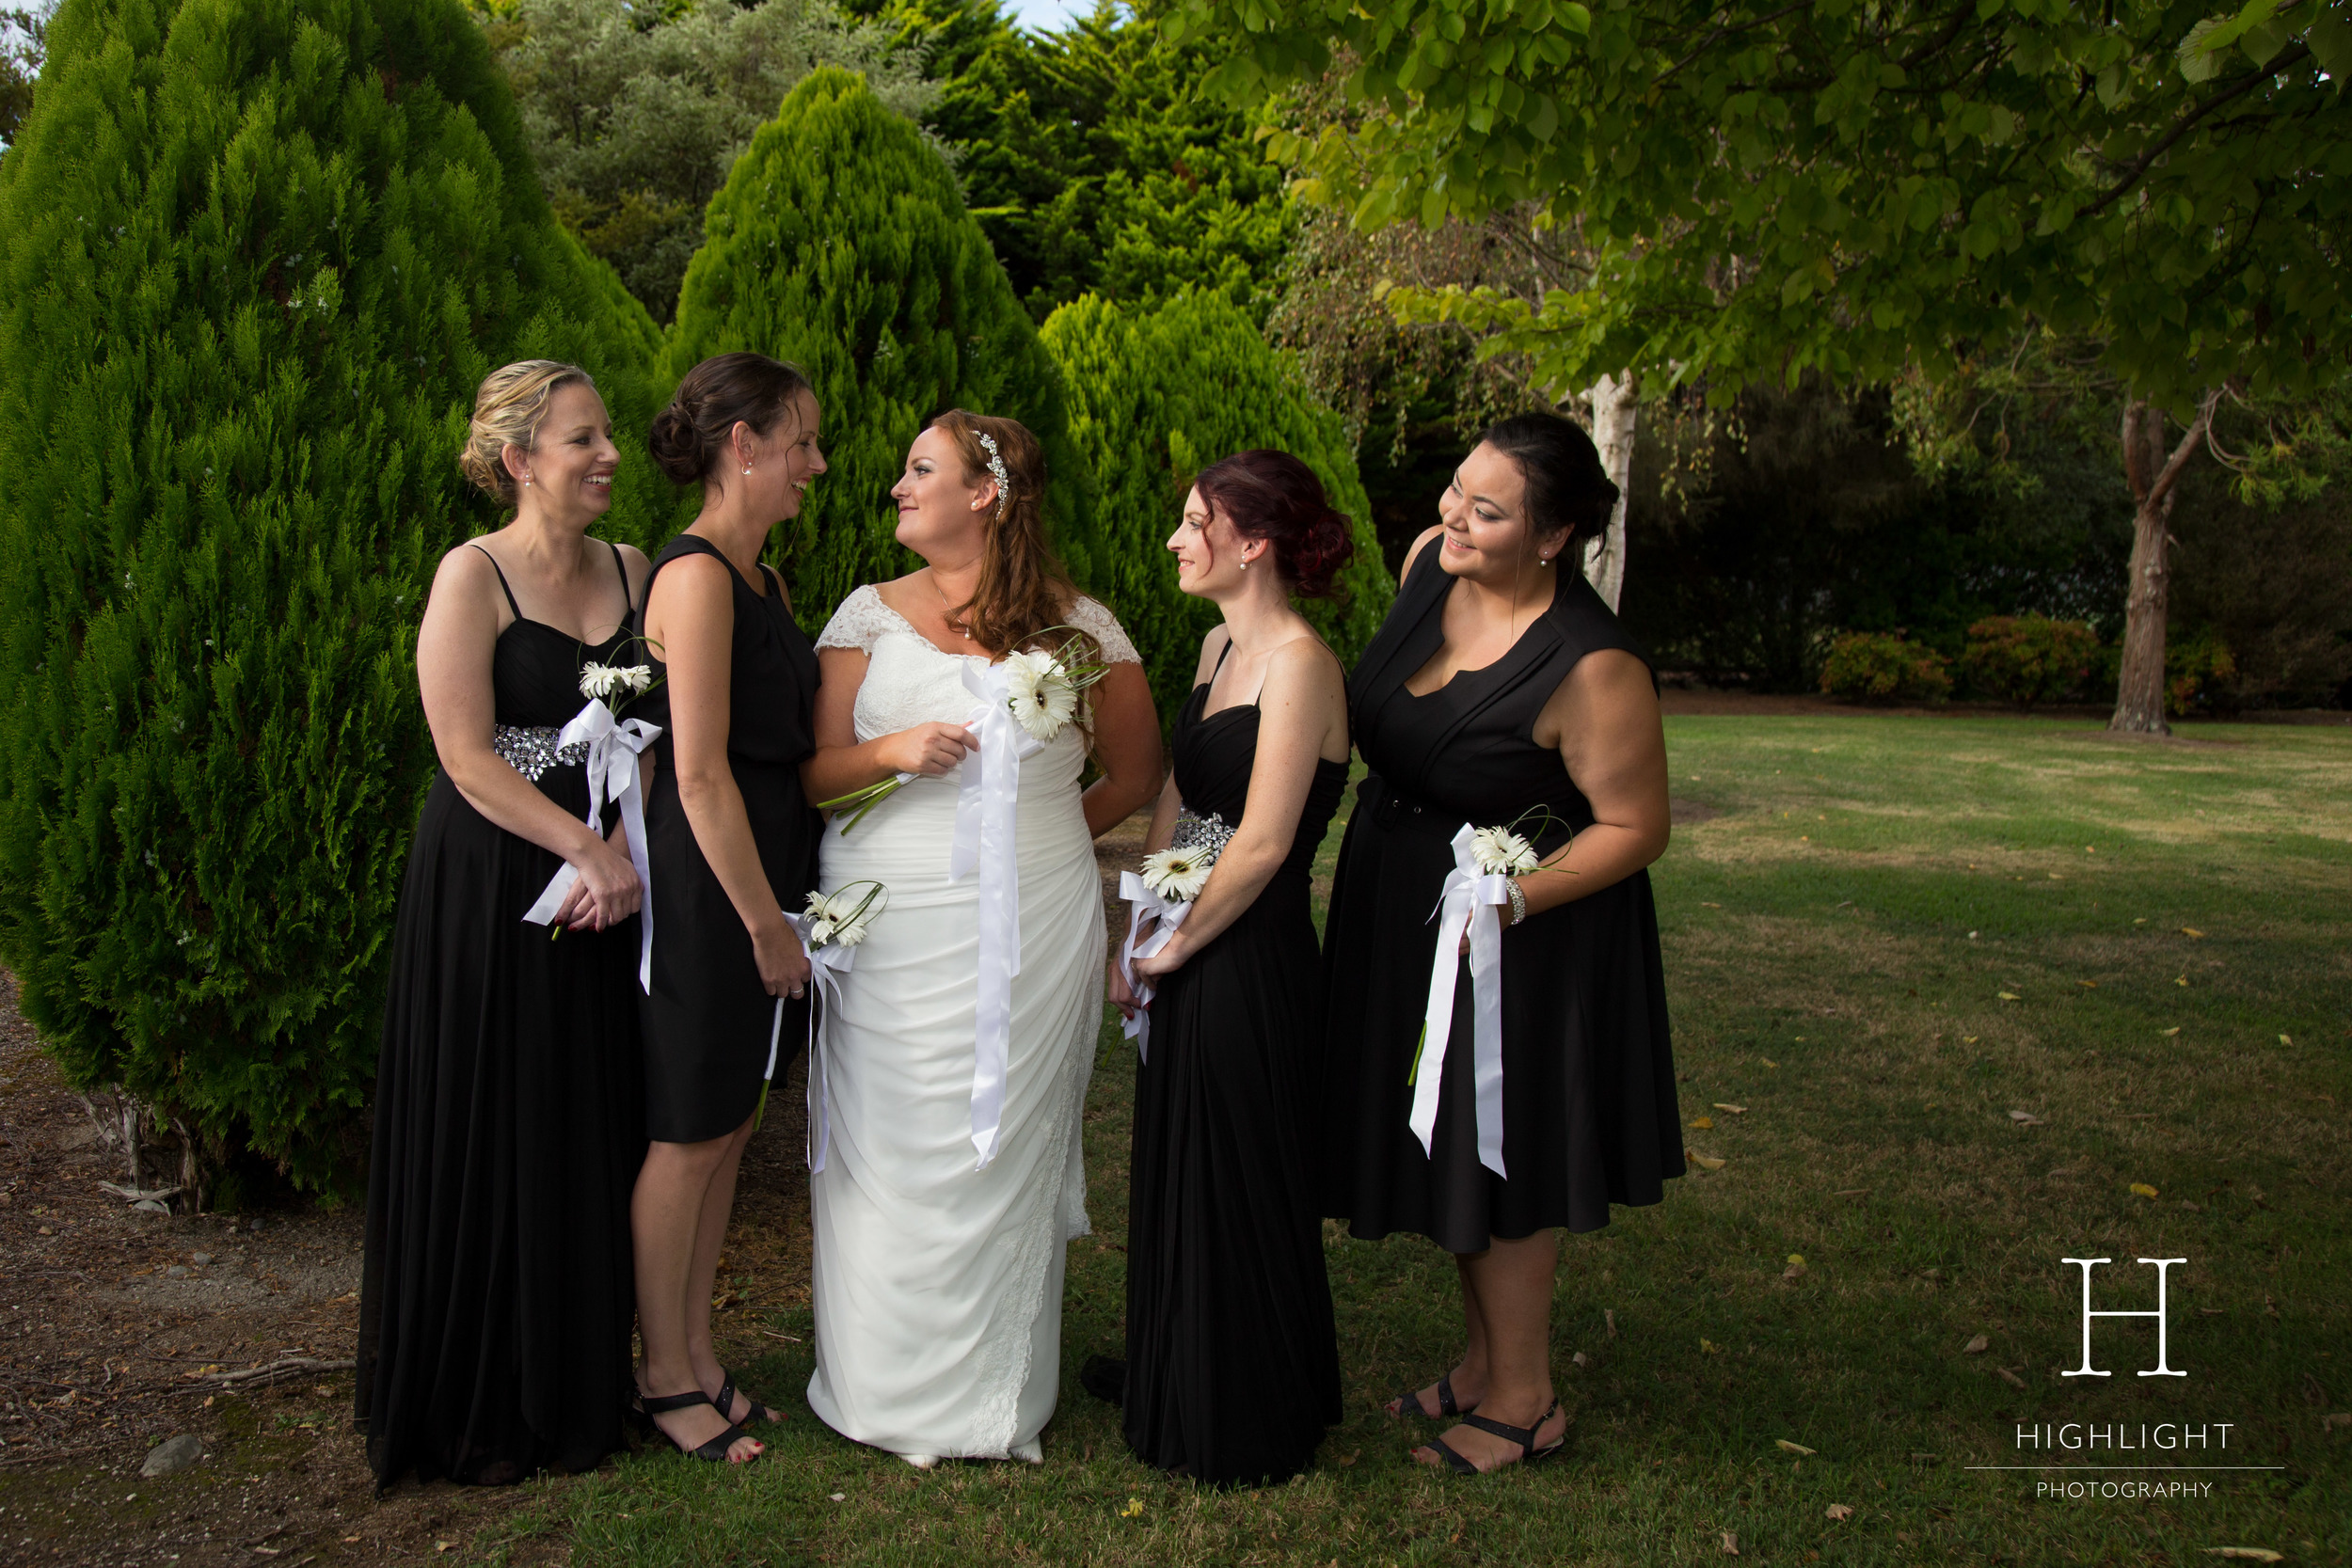 highlight_wedding_photography_palmerston_north.jpg